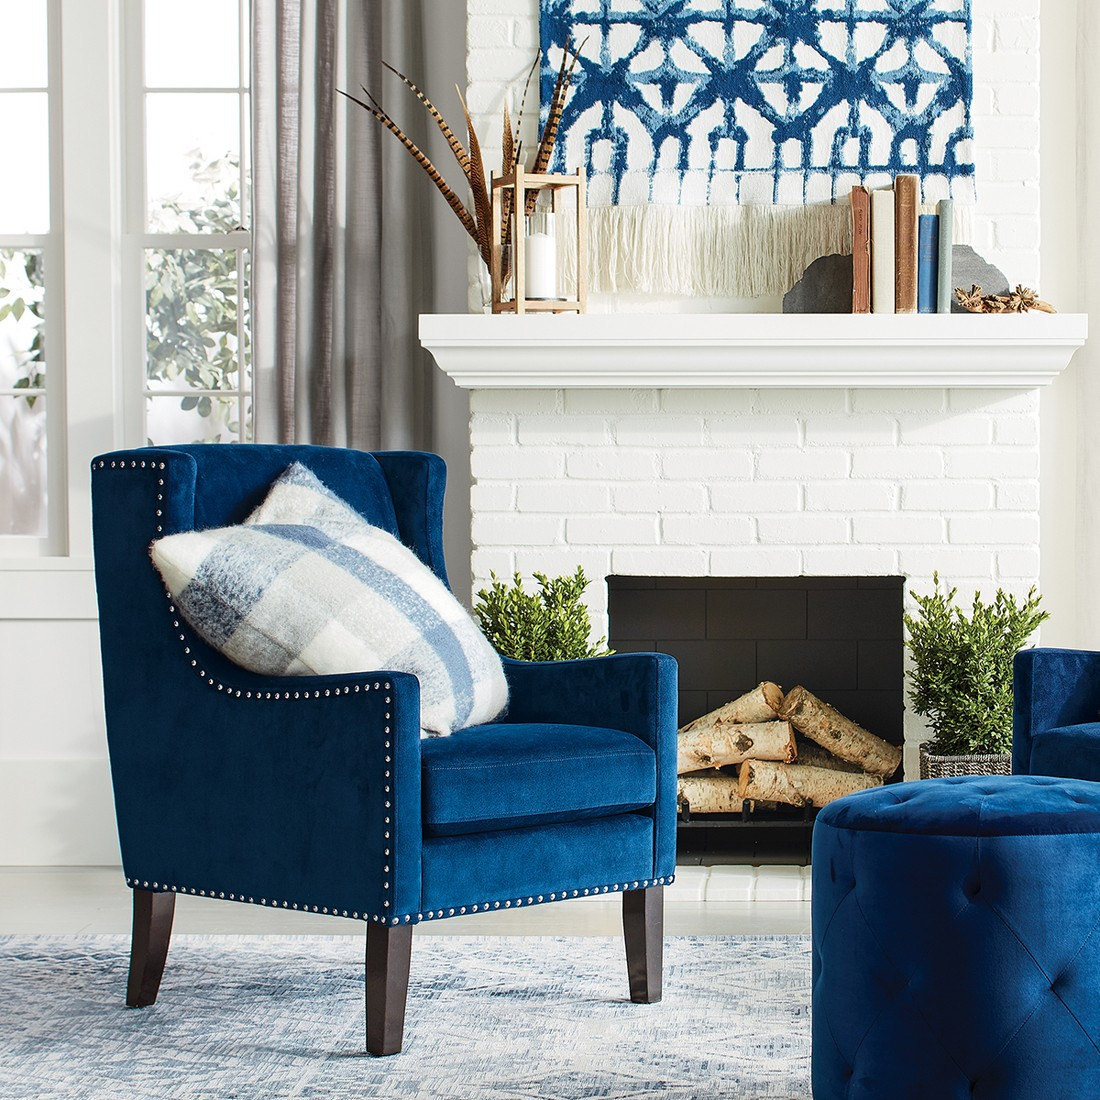 Home Design Inspiration home ideas, design & inspiration : target